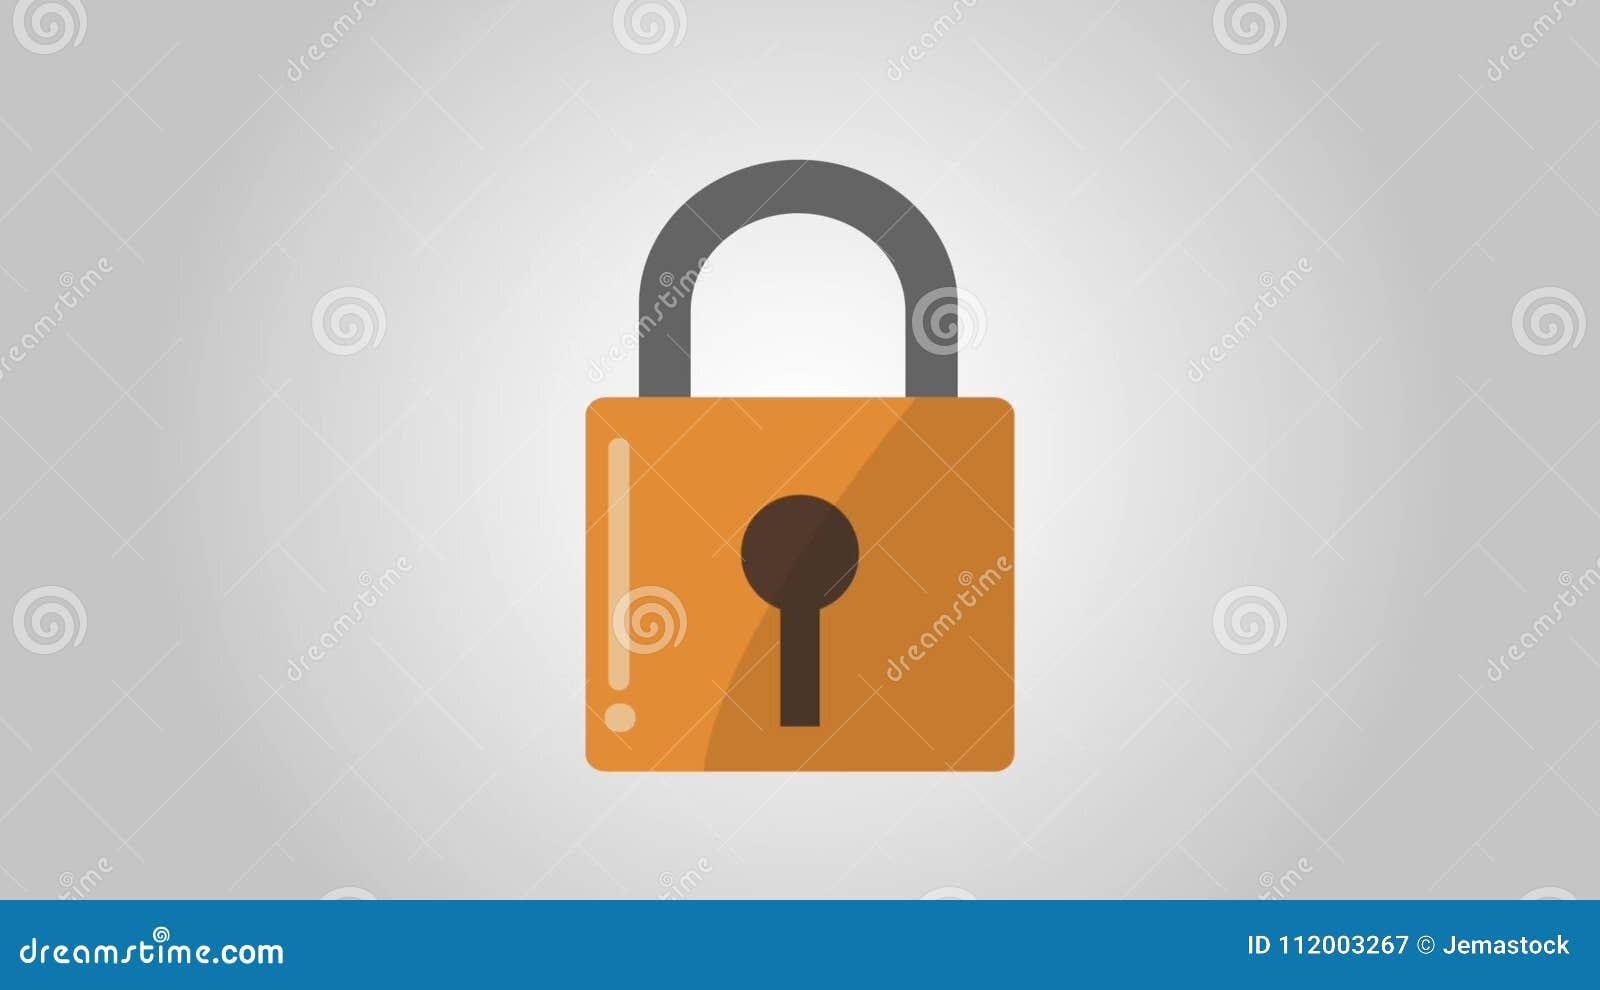 Padlock Security Symbol Hd Animation Stock Video Video Of